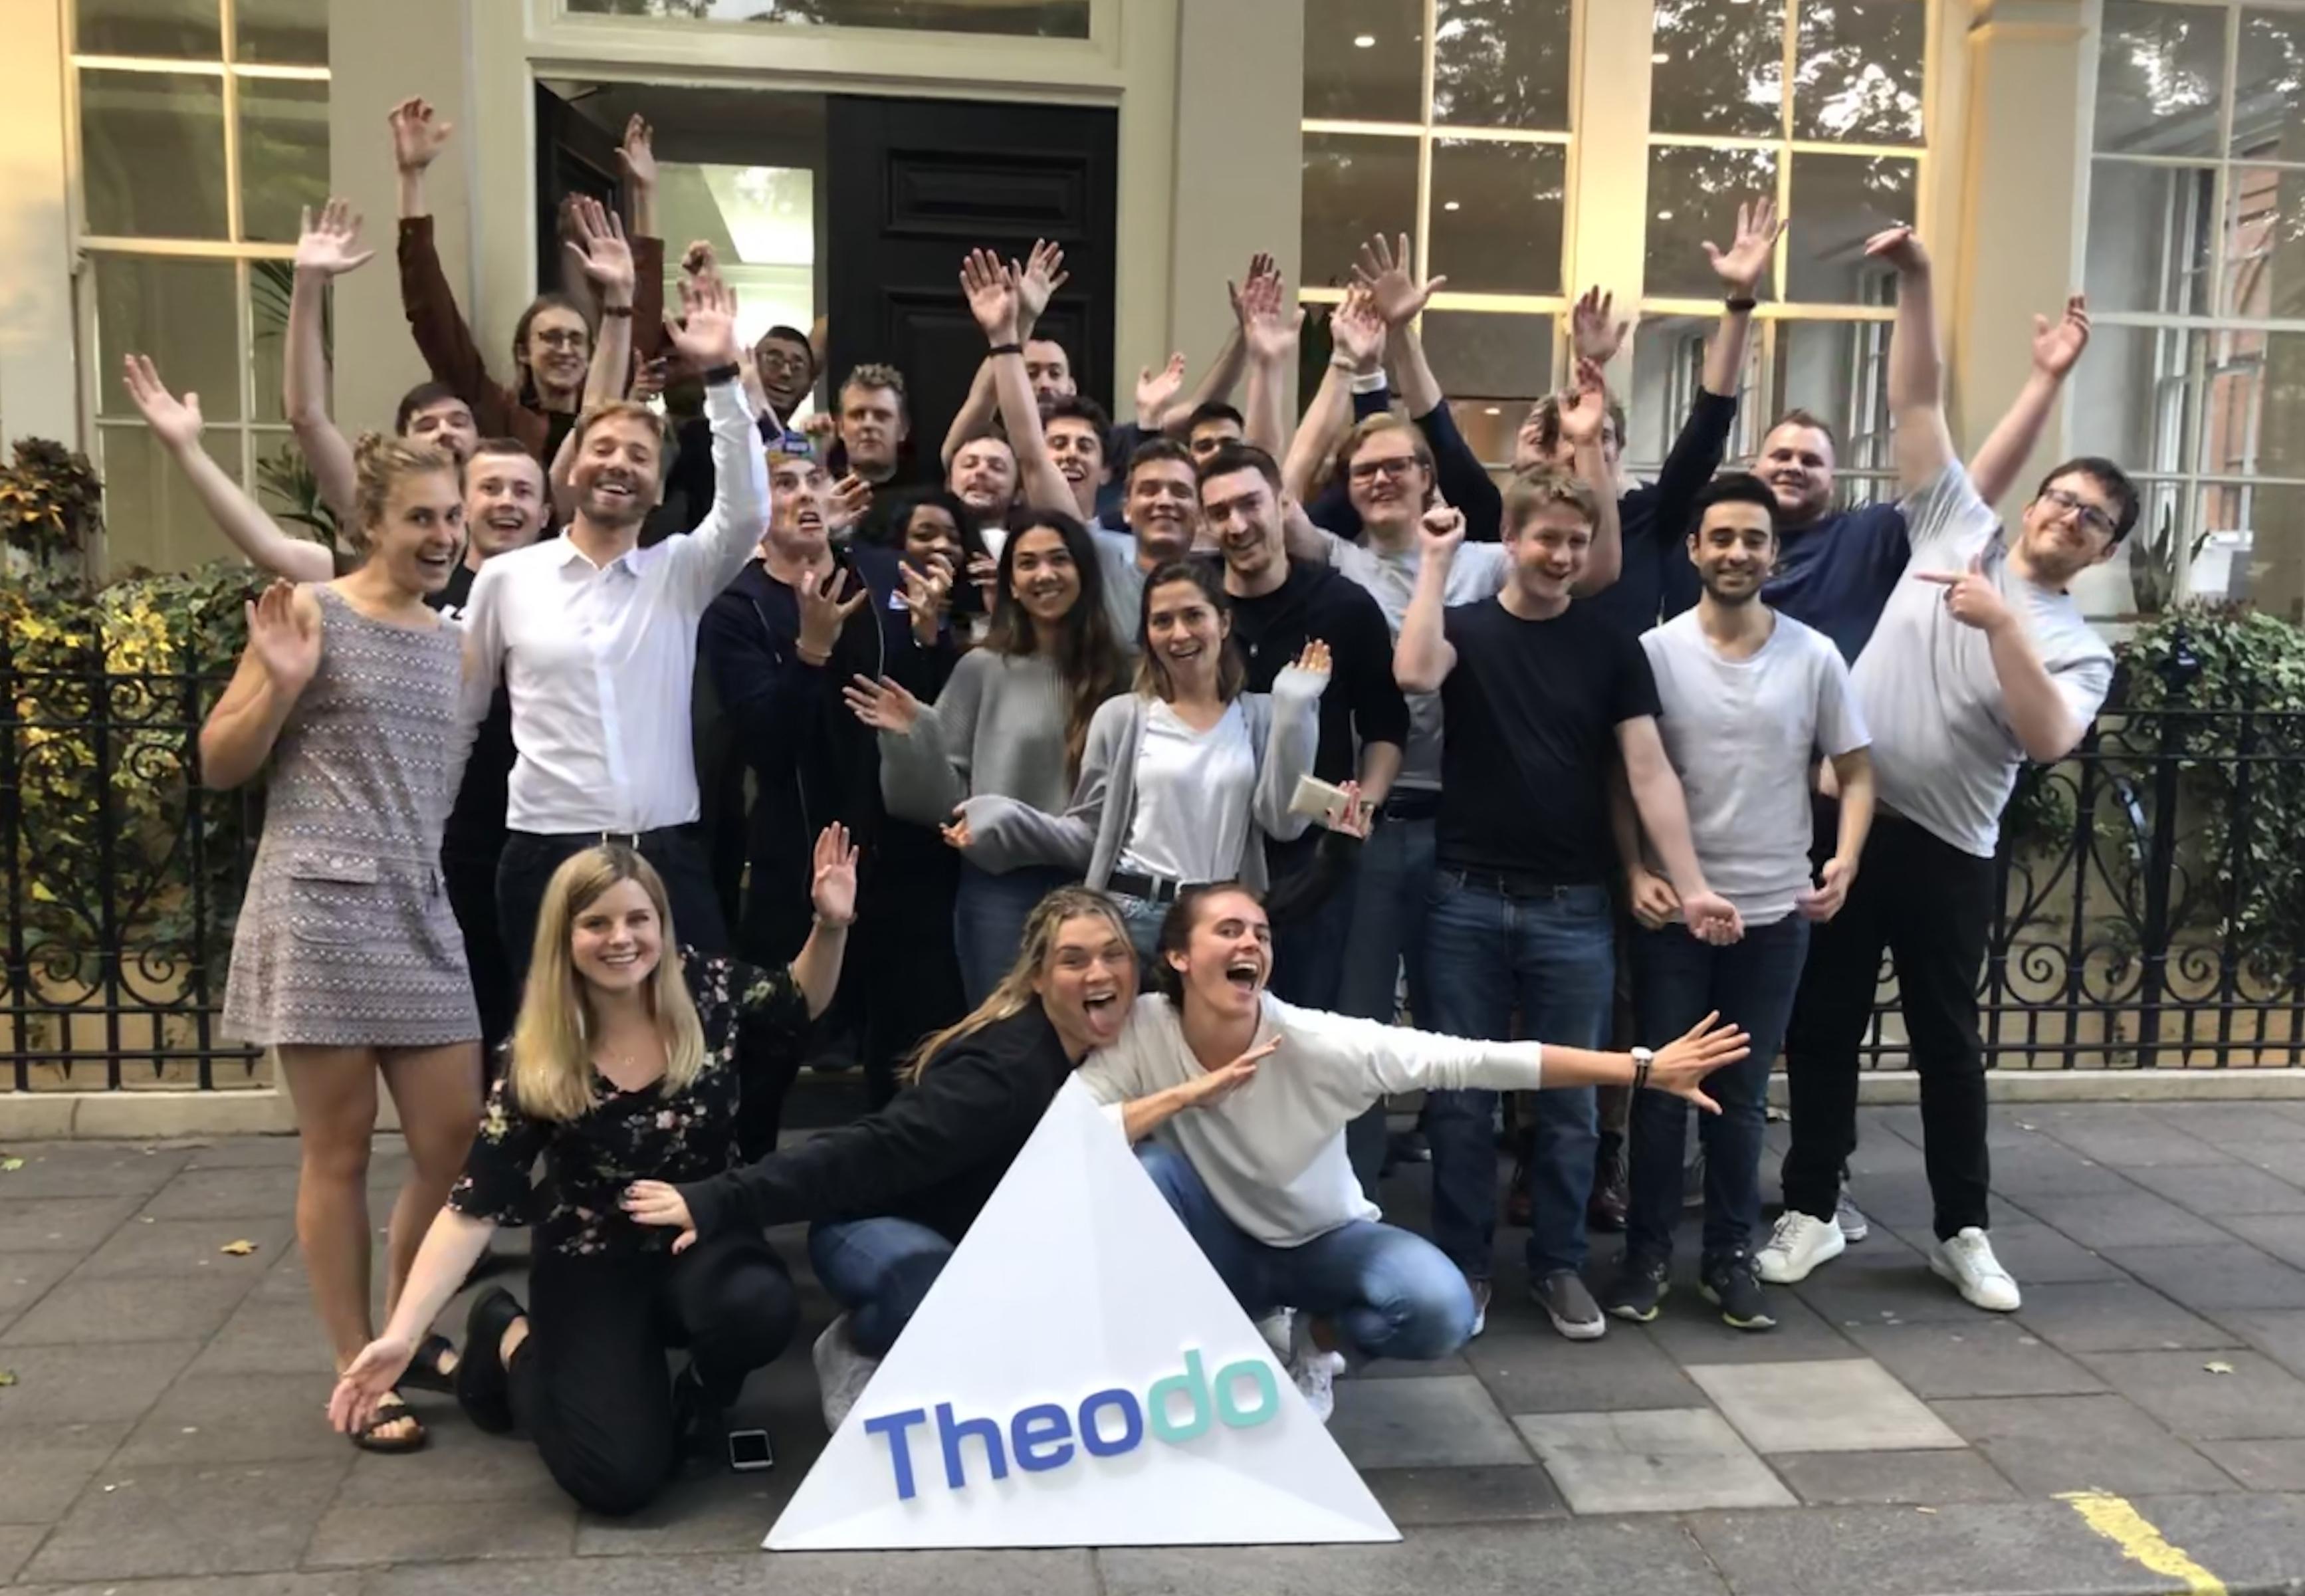 THEODO UK - founded in 2015